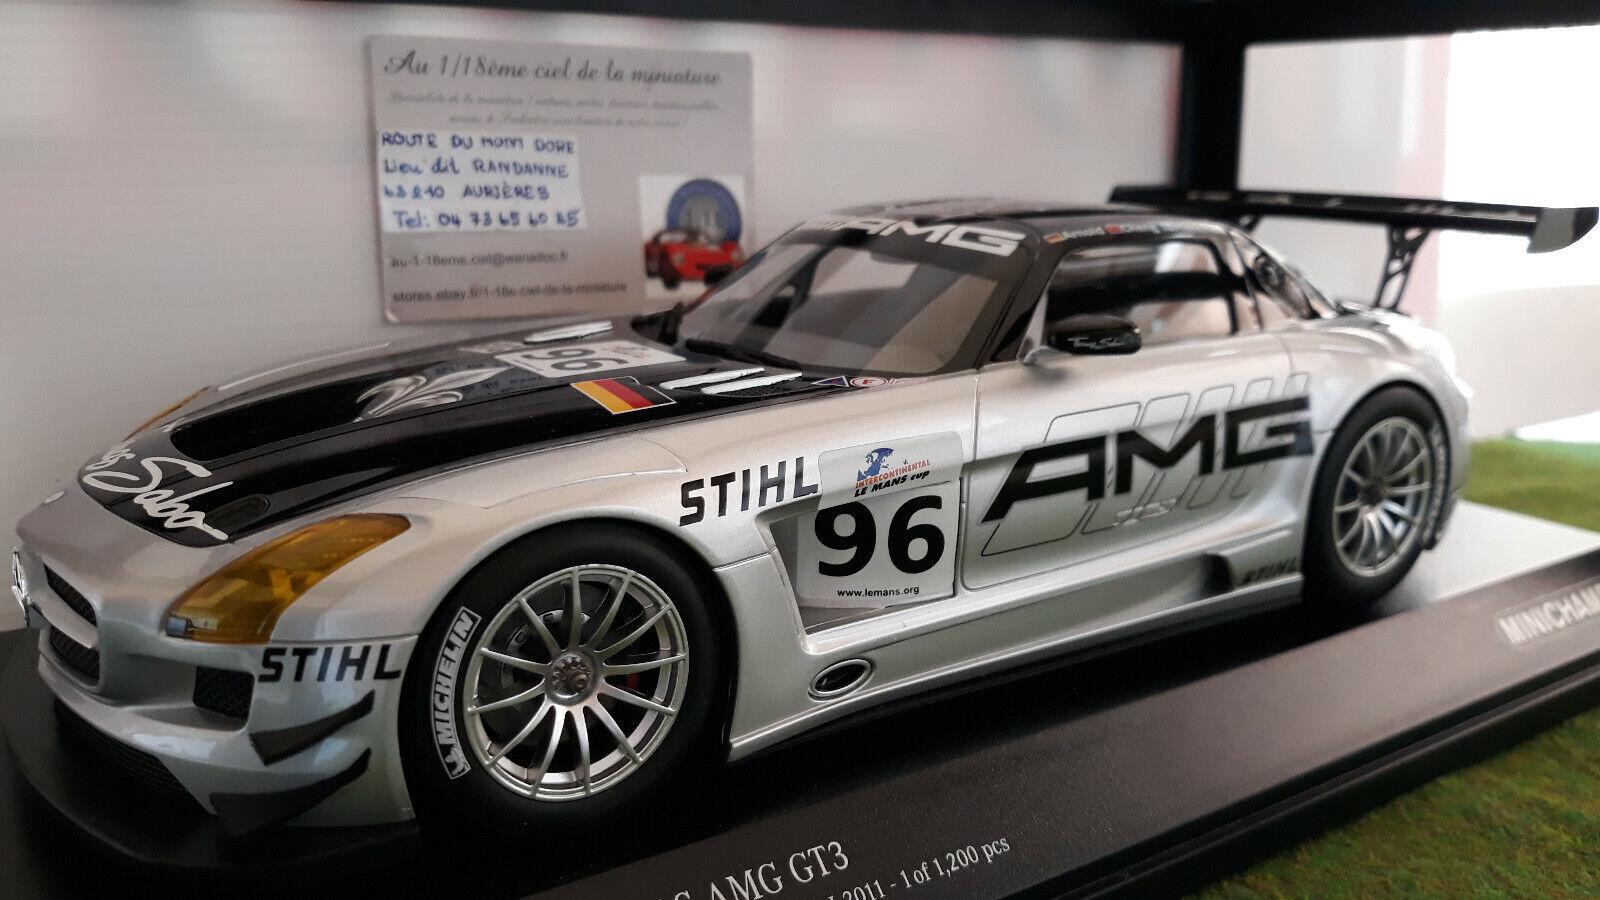 MERCEDES-BENZ SLS AMG  GT3 HAKKINEN o 1 18 MINICHAMPS 151113196 voiture miniature  plus d'ordre